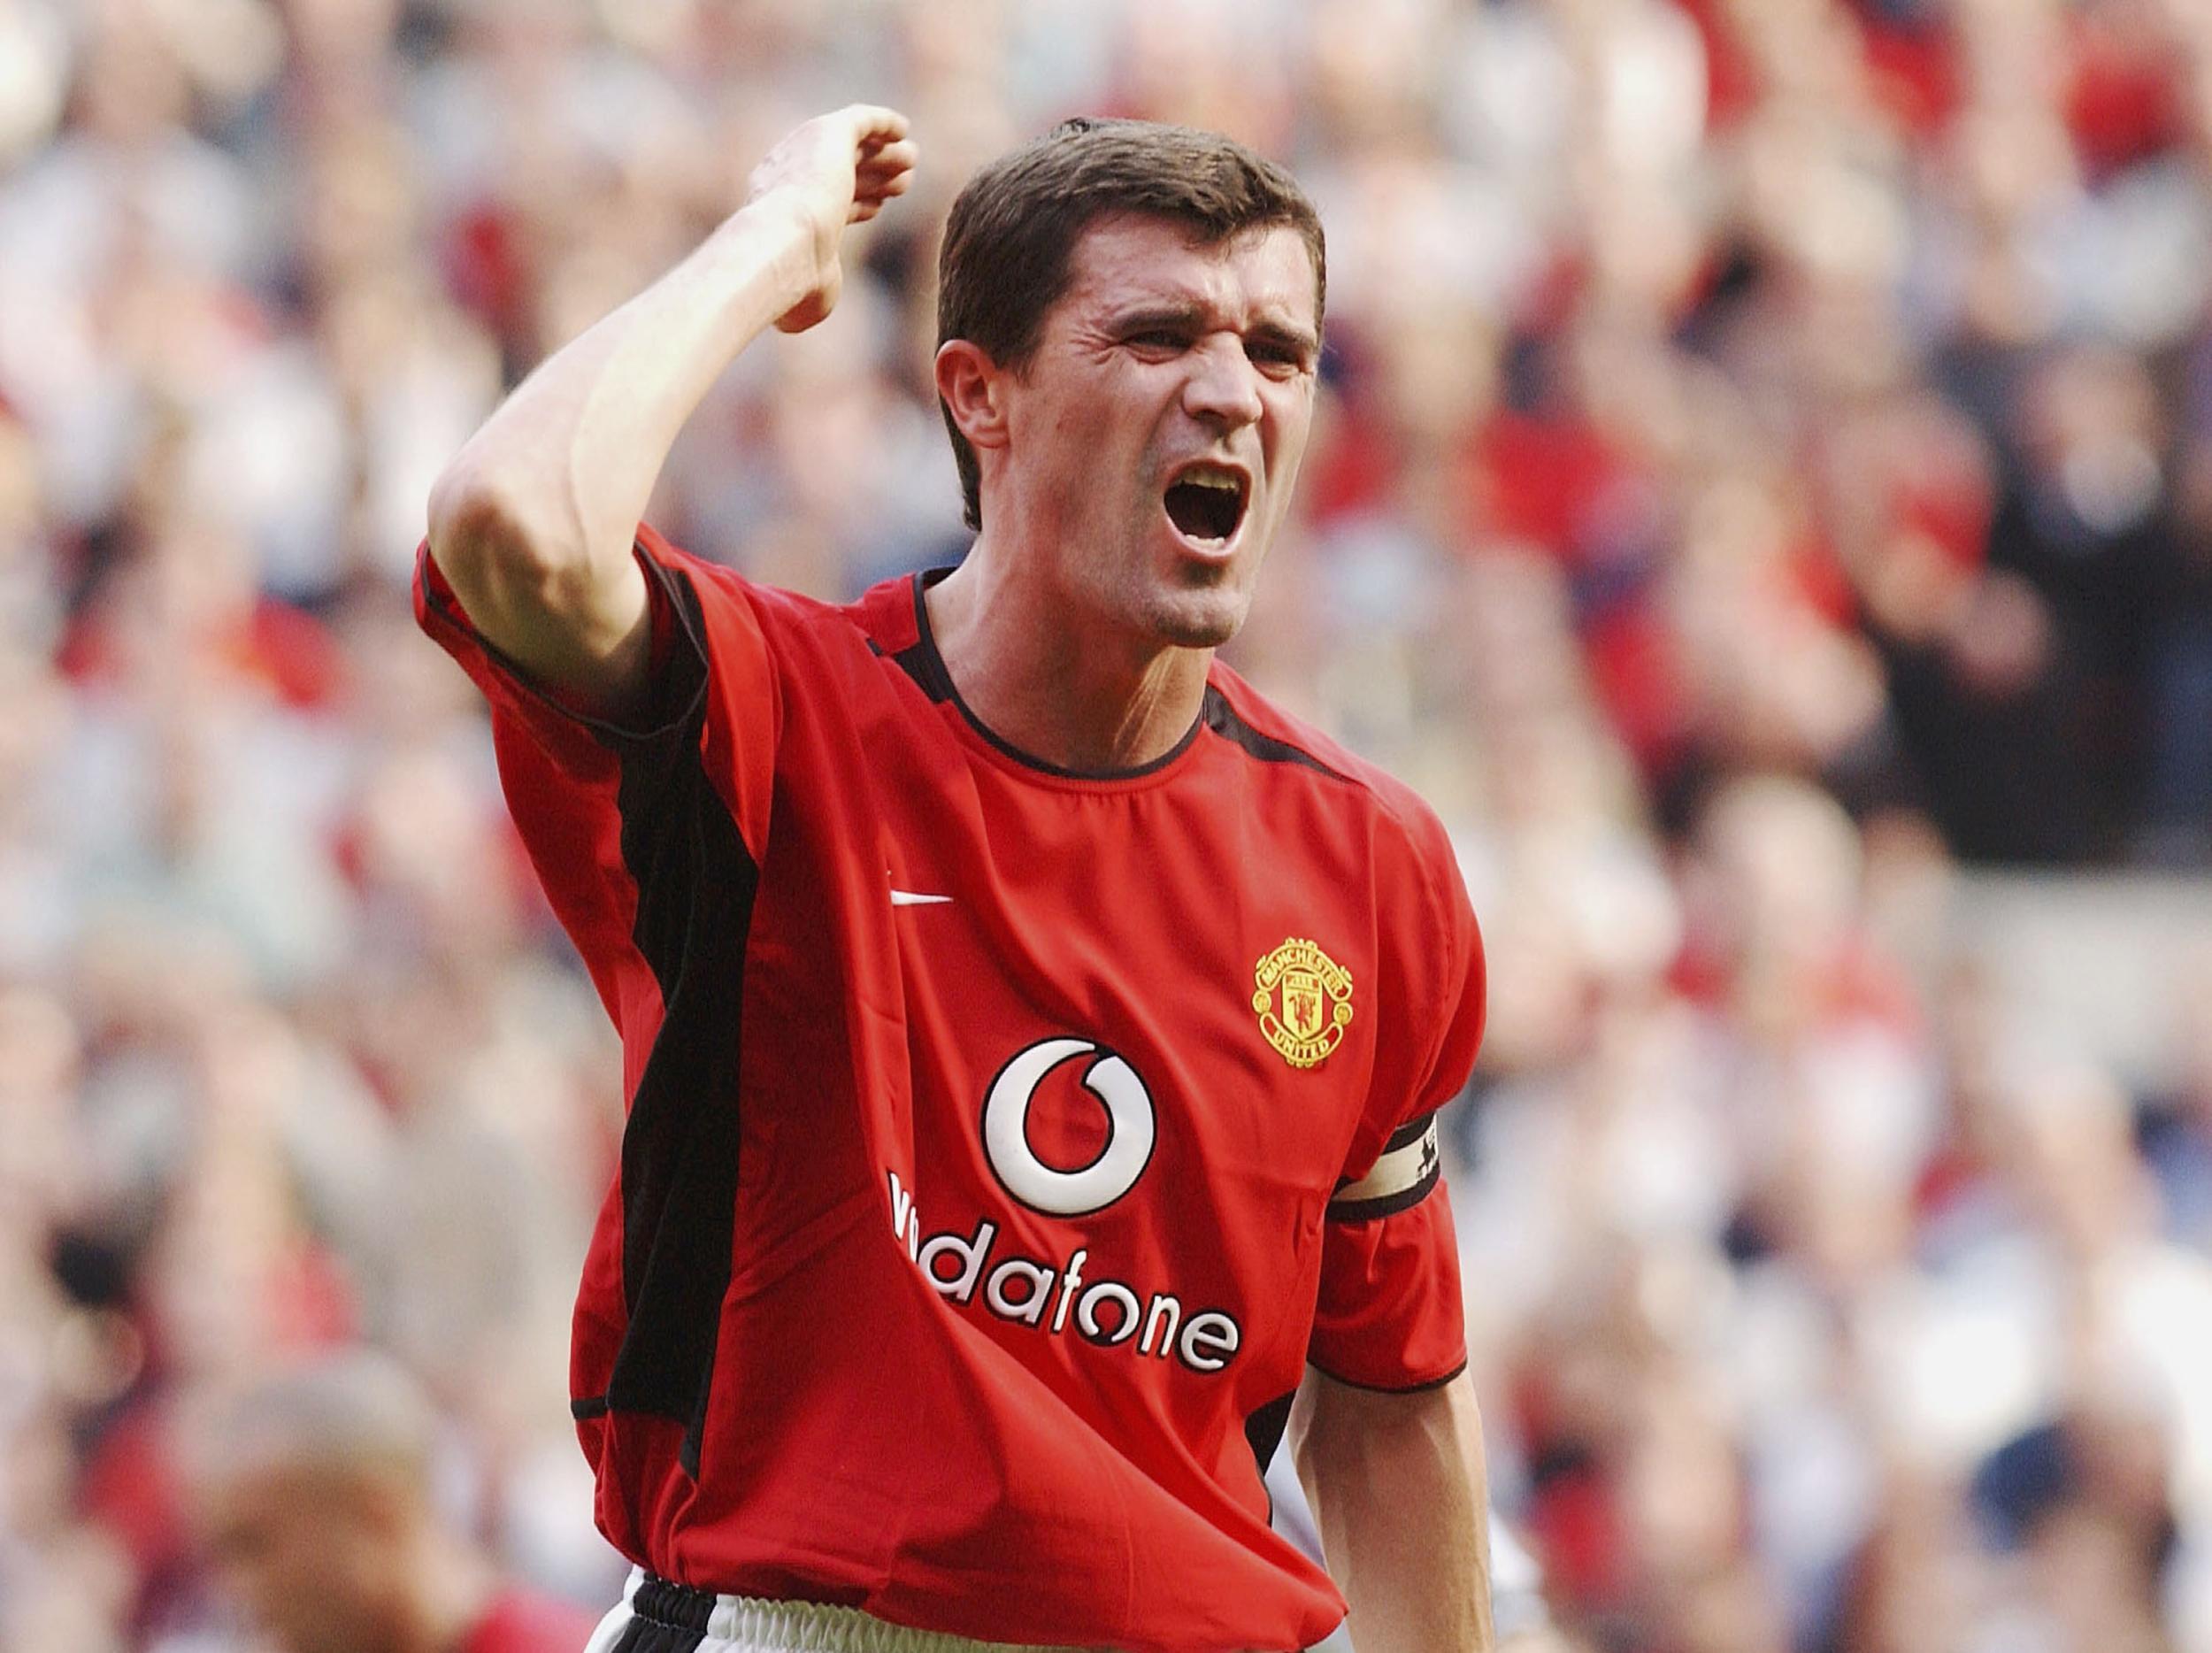 36. Roy Keane